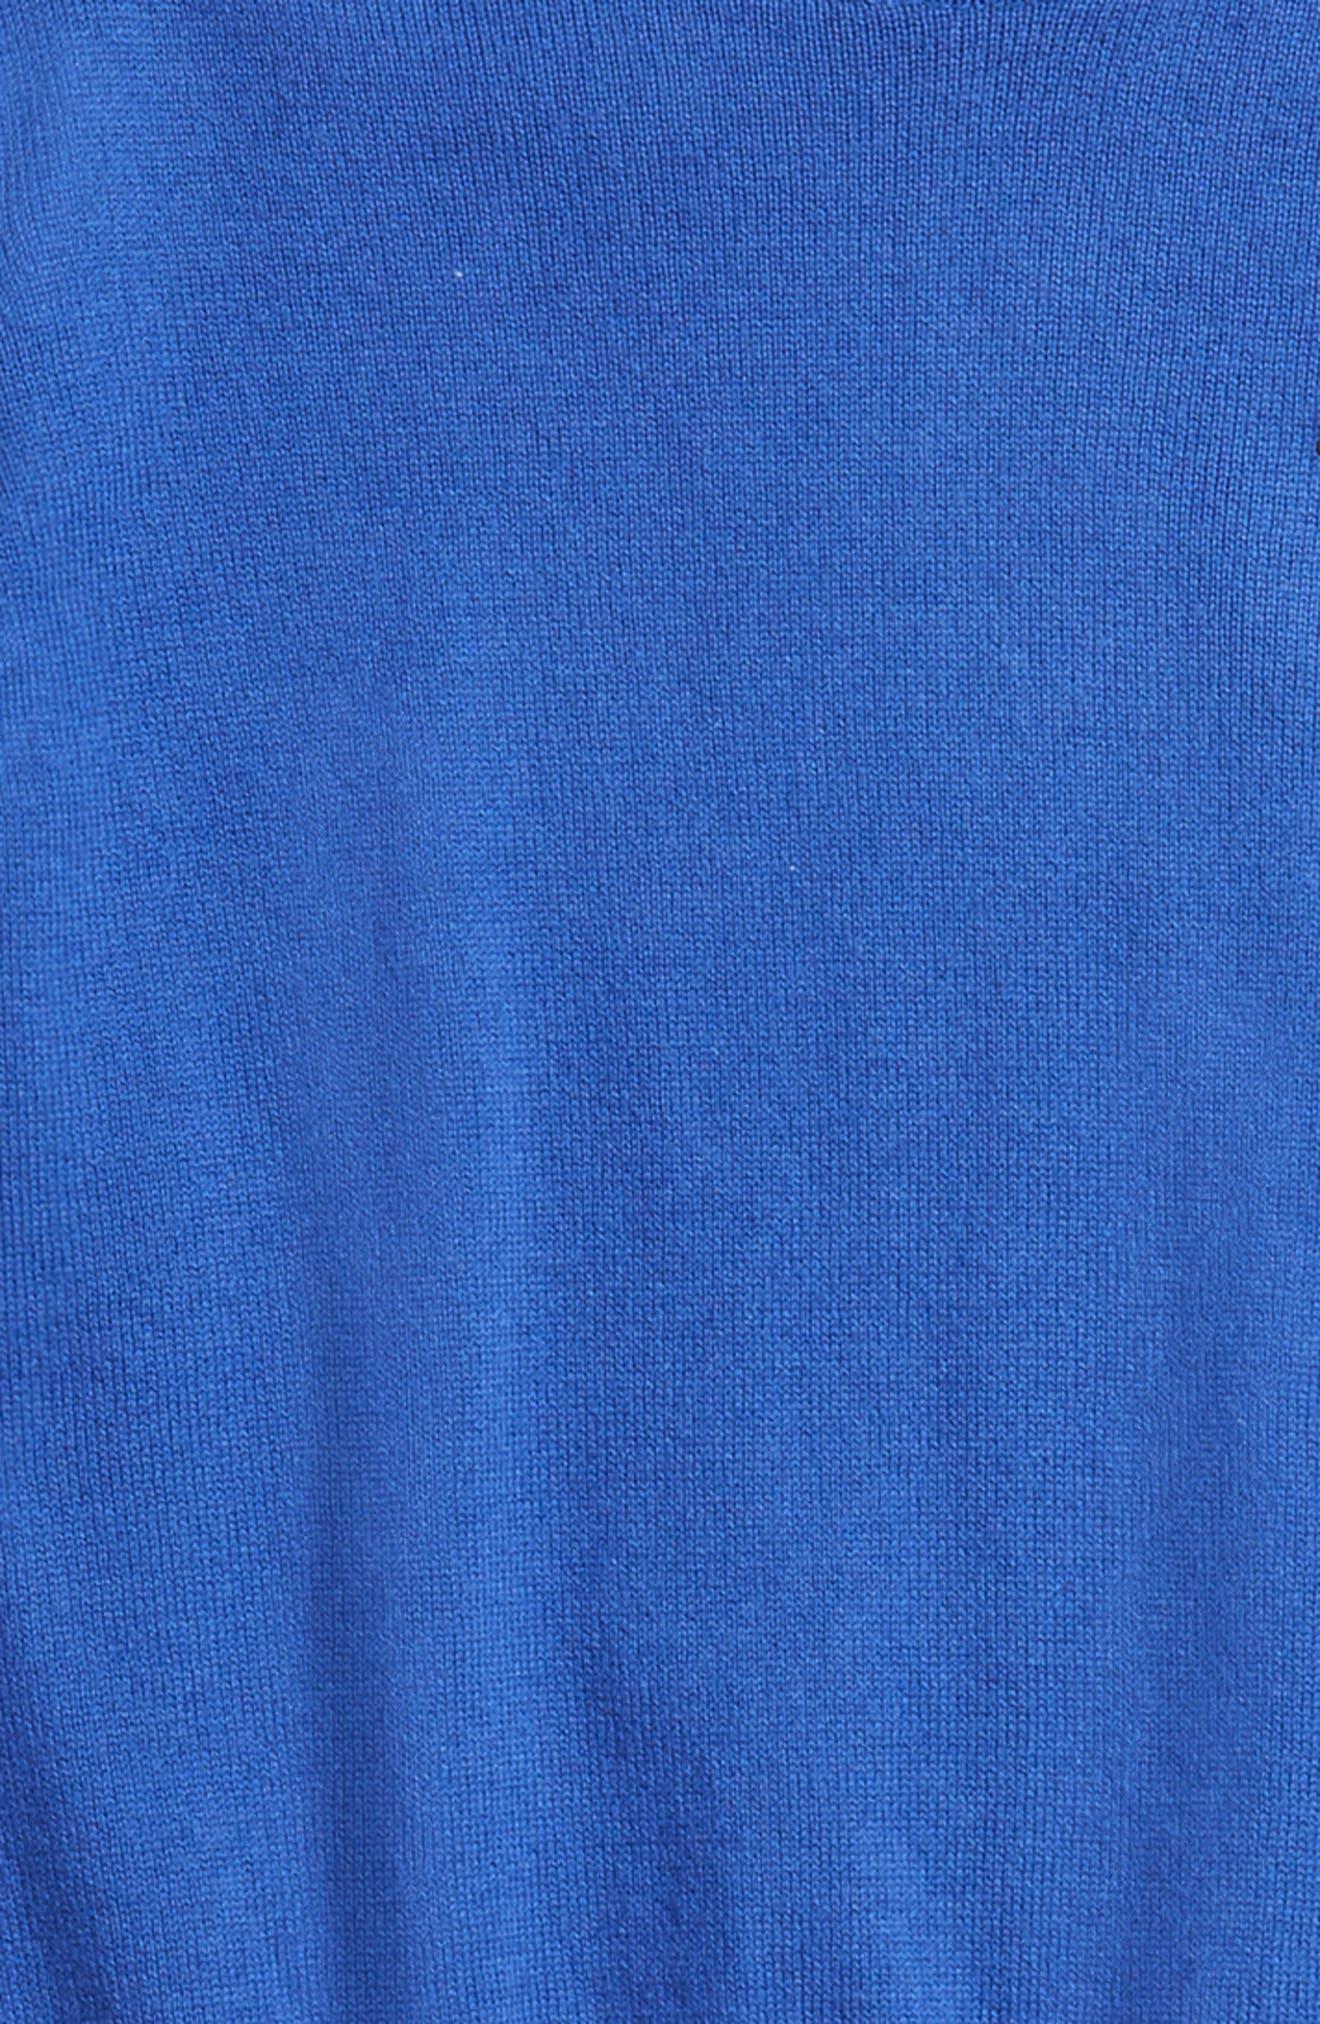 Alternate Image 2  - Armani Junior Sweater (Little Boys & Big Boys)